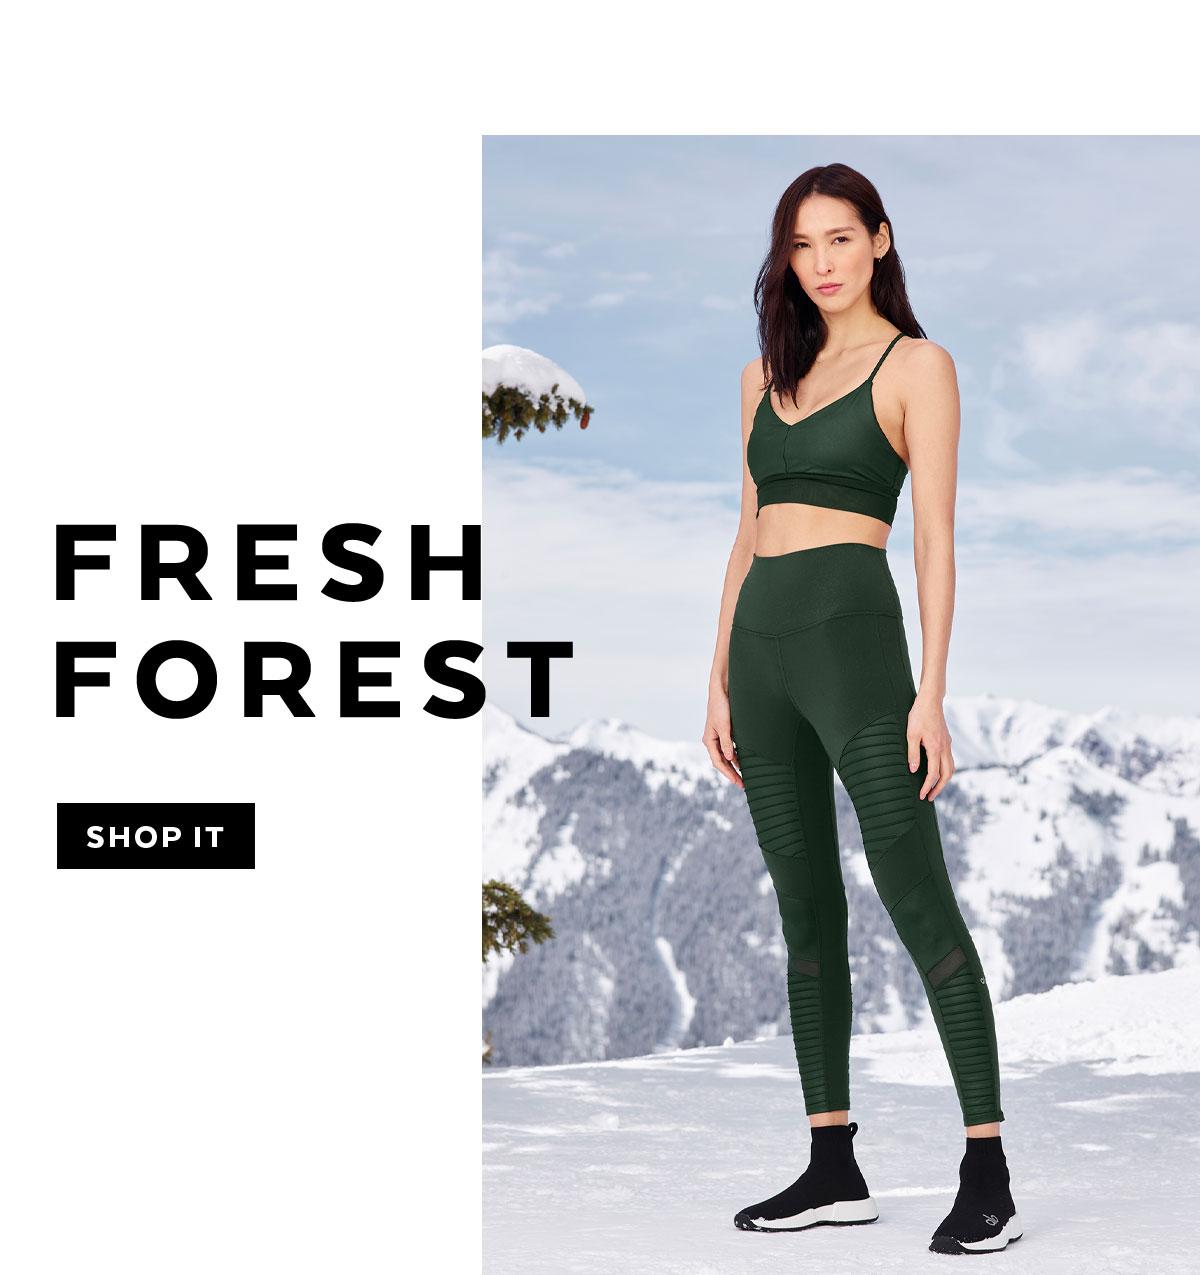 FRESH FOREST. SHOP IT